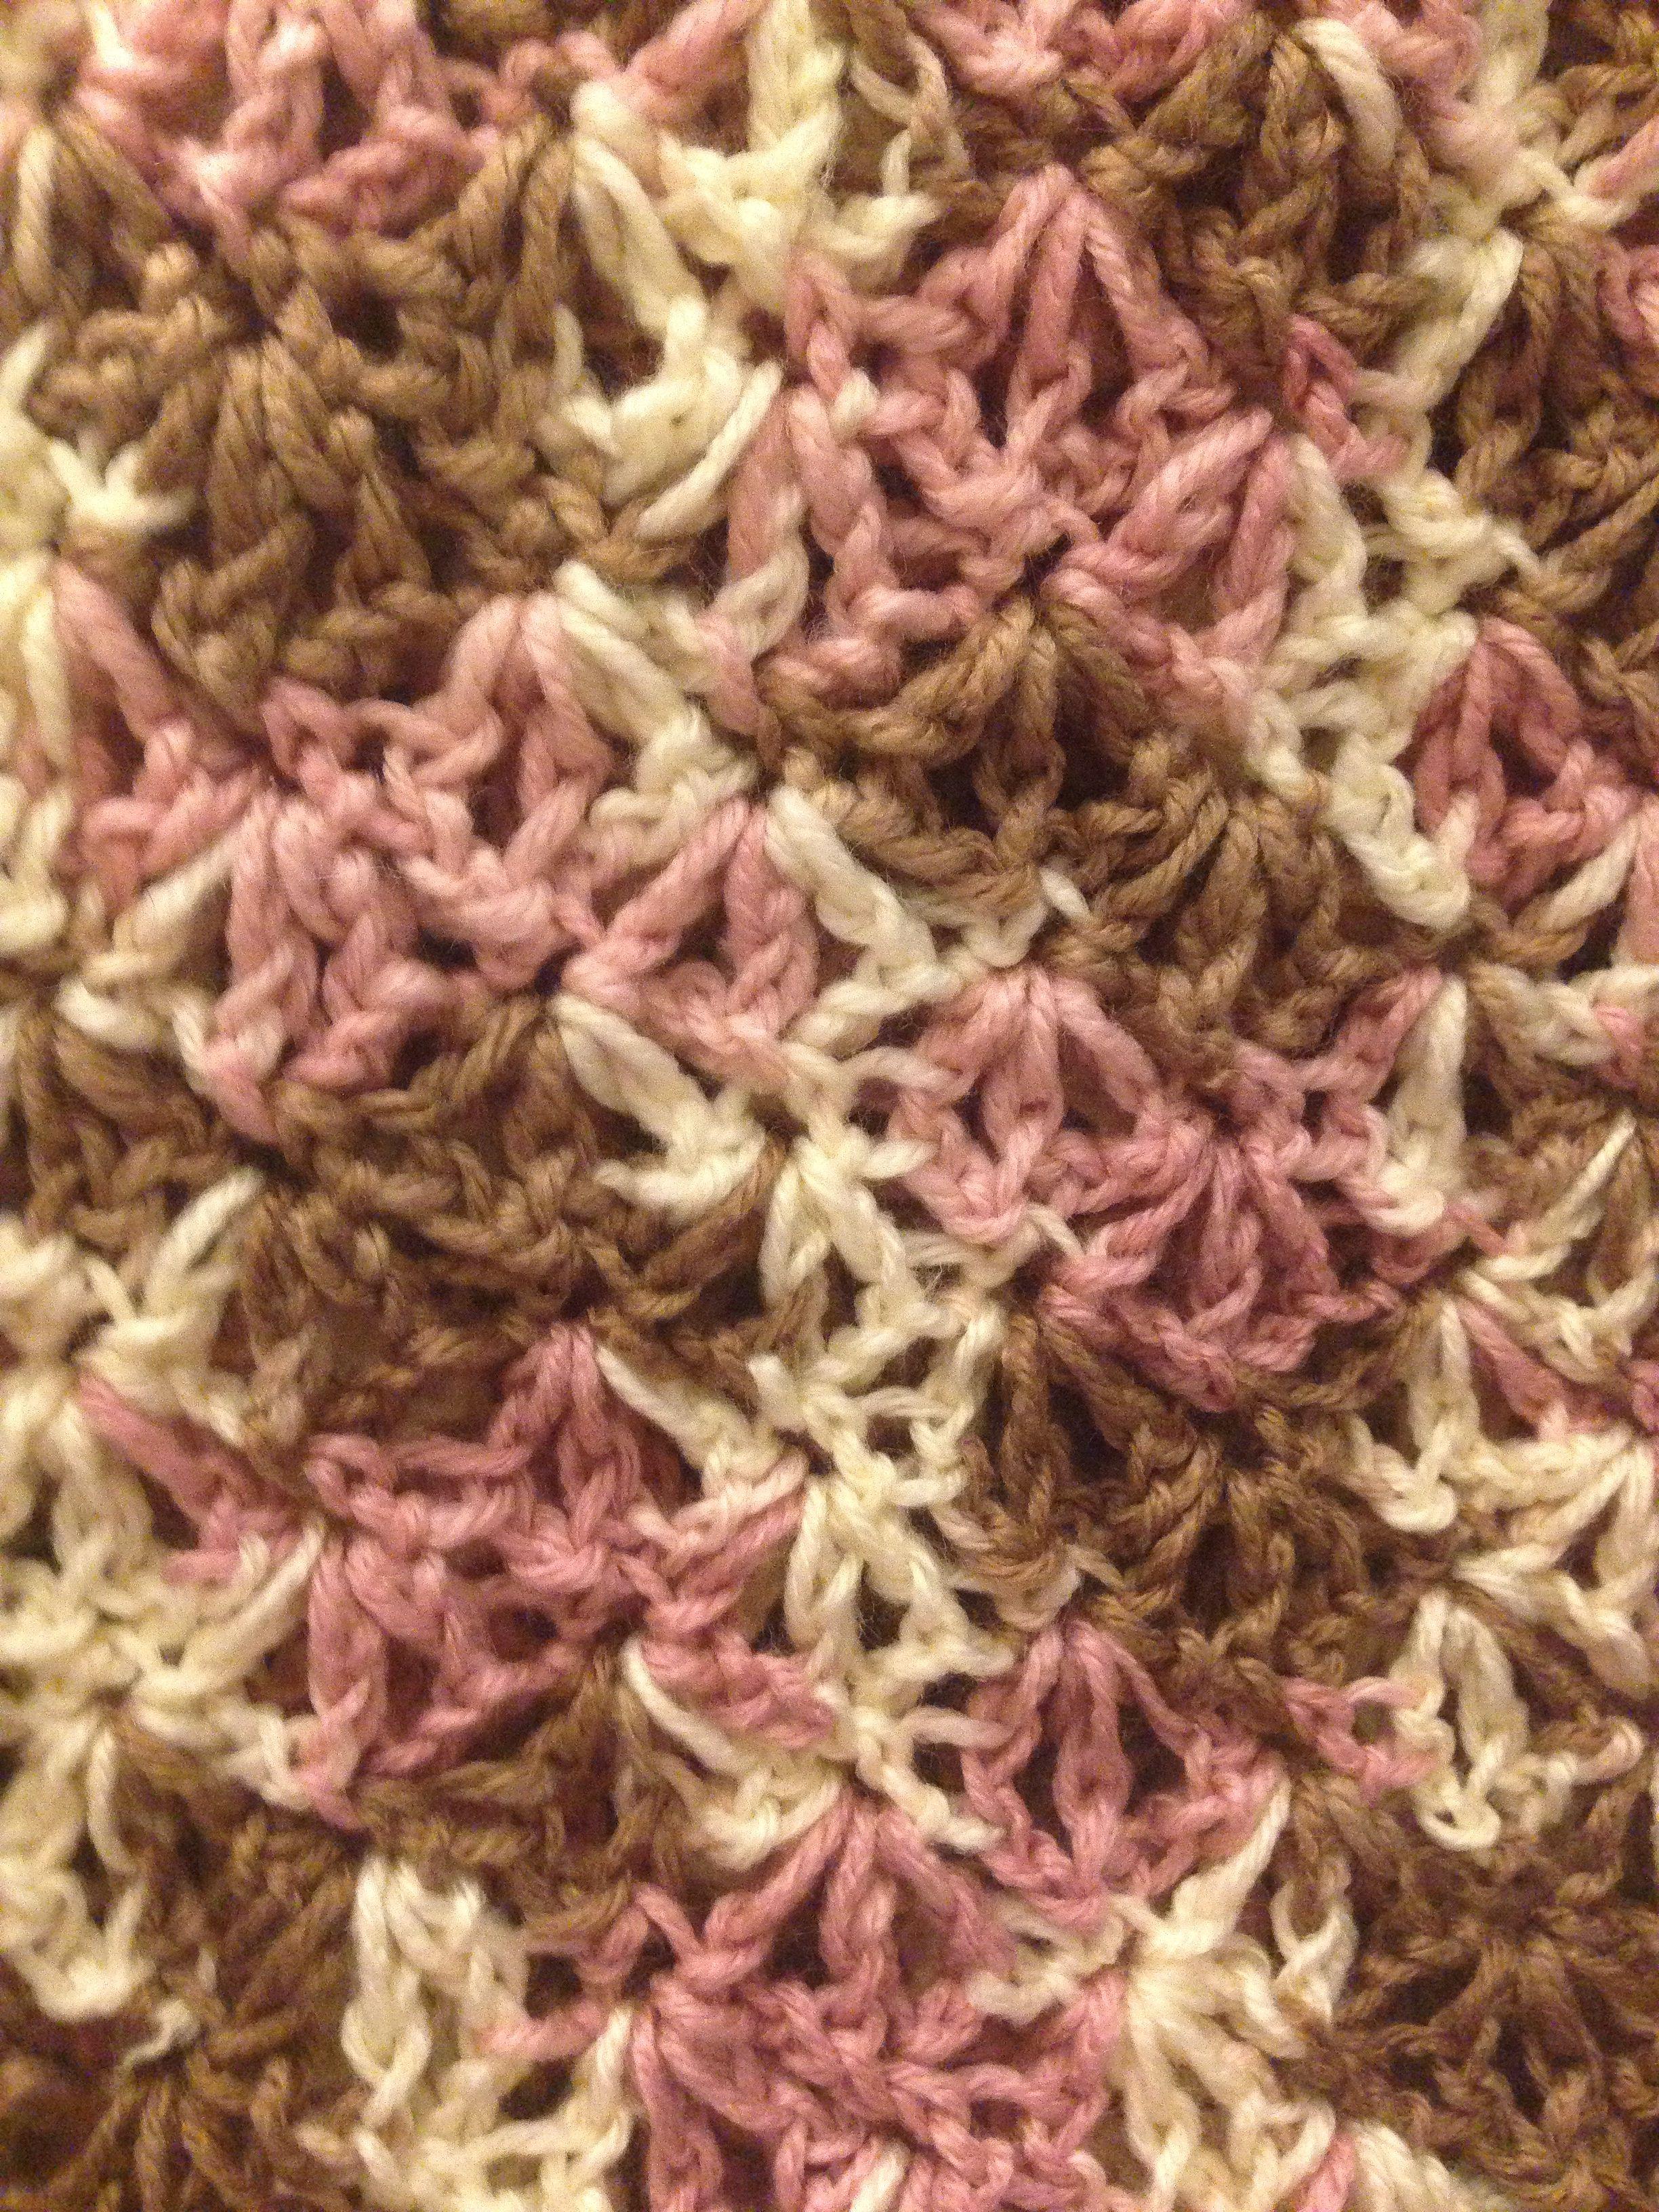 Crochet Stitches Variegated Yarn : Shell stitch with variegated yarn Knitting and Crocheting Pintere ...